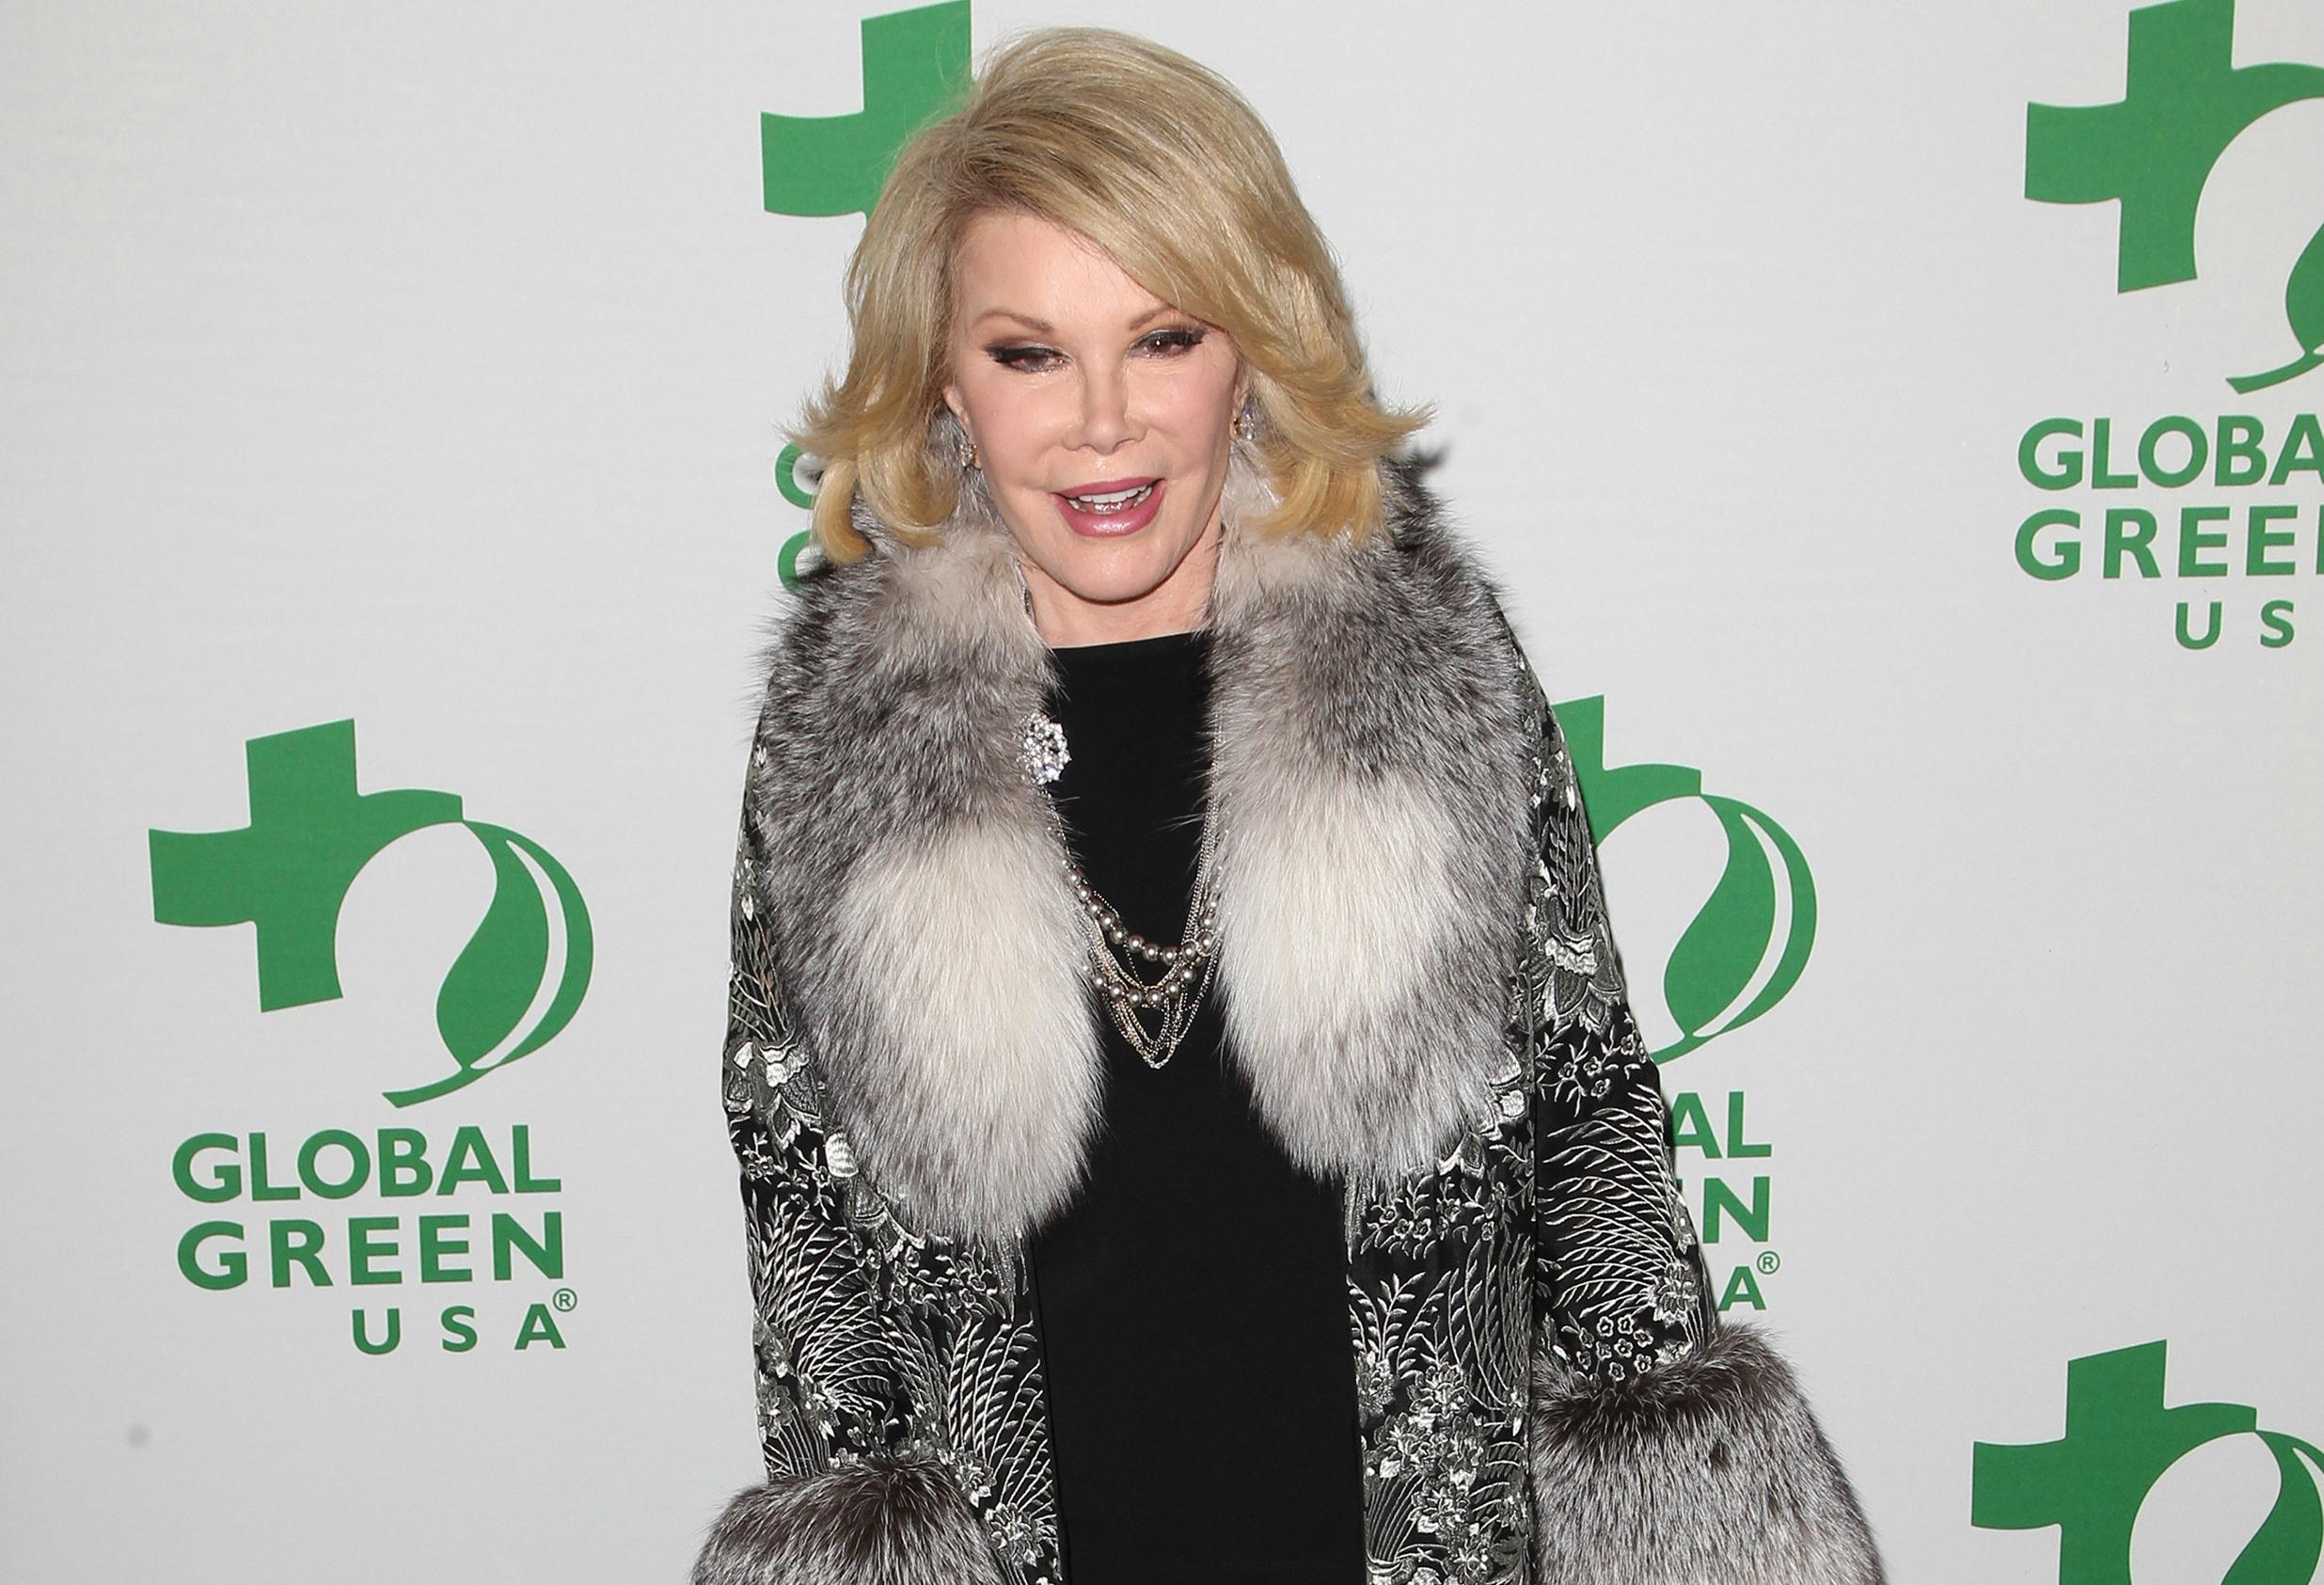 Joan Rivers slams Gwyneth Paltrow on Watch What Happens Live